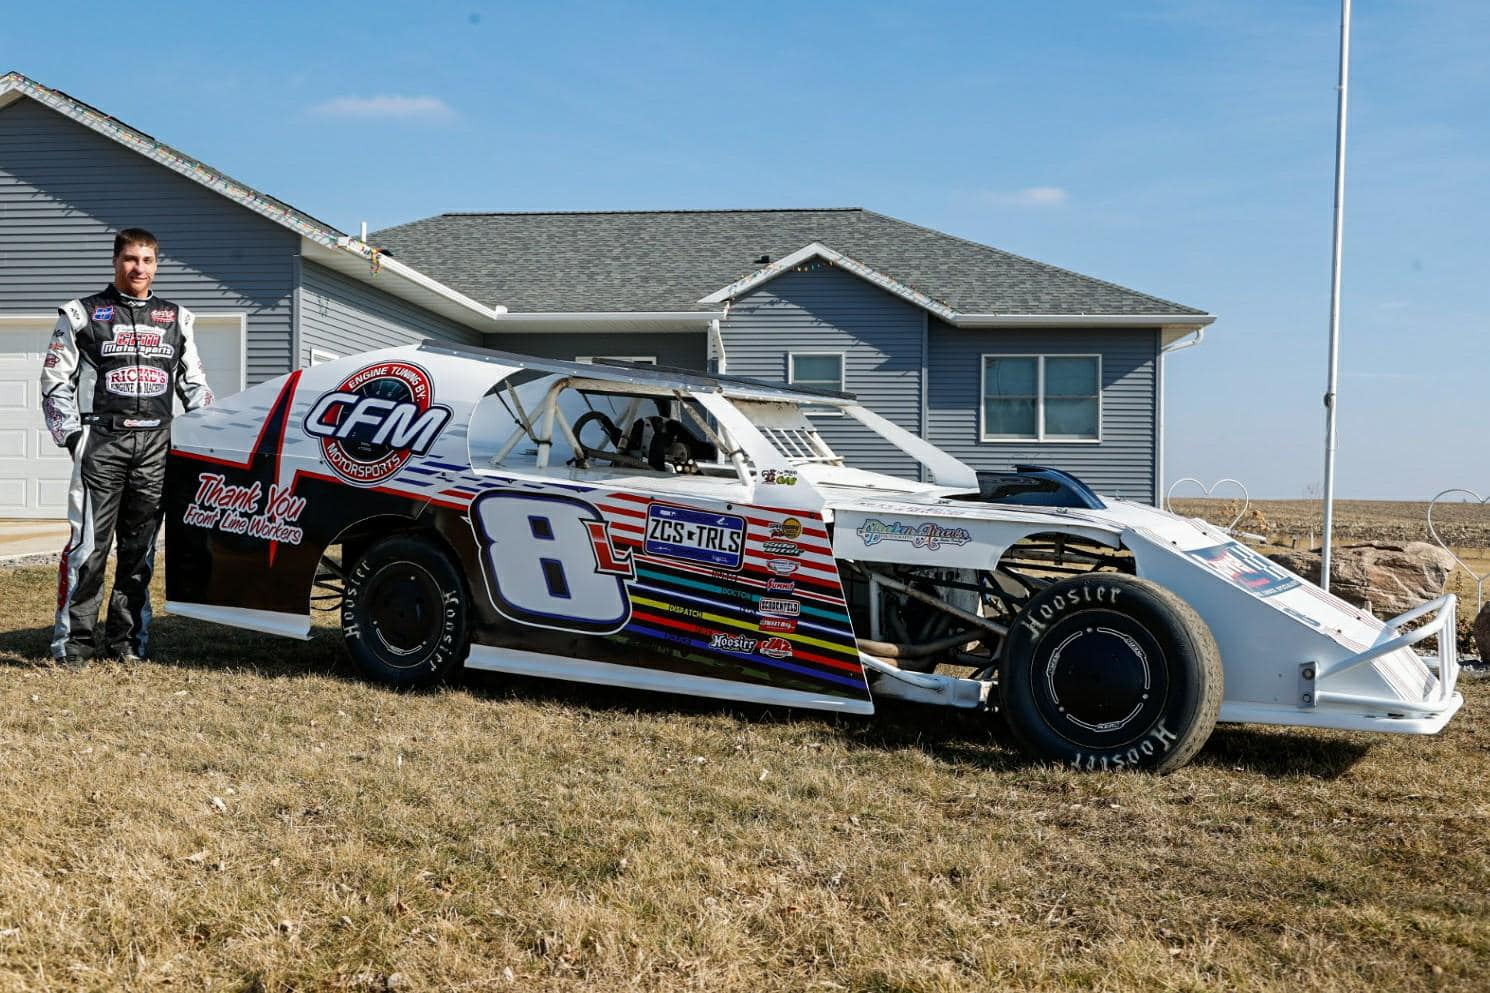 Lyle Sathoff Racing